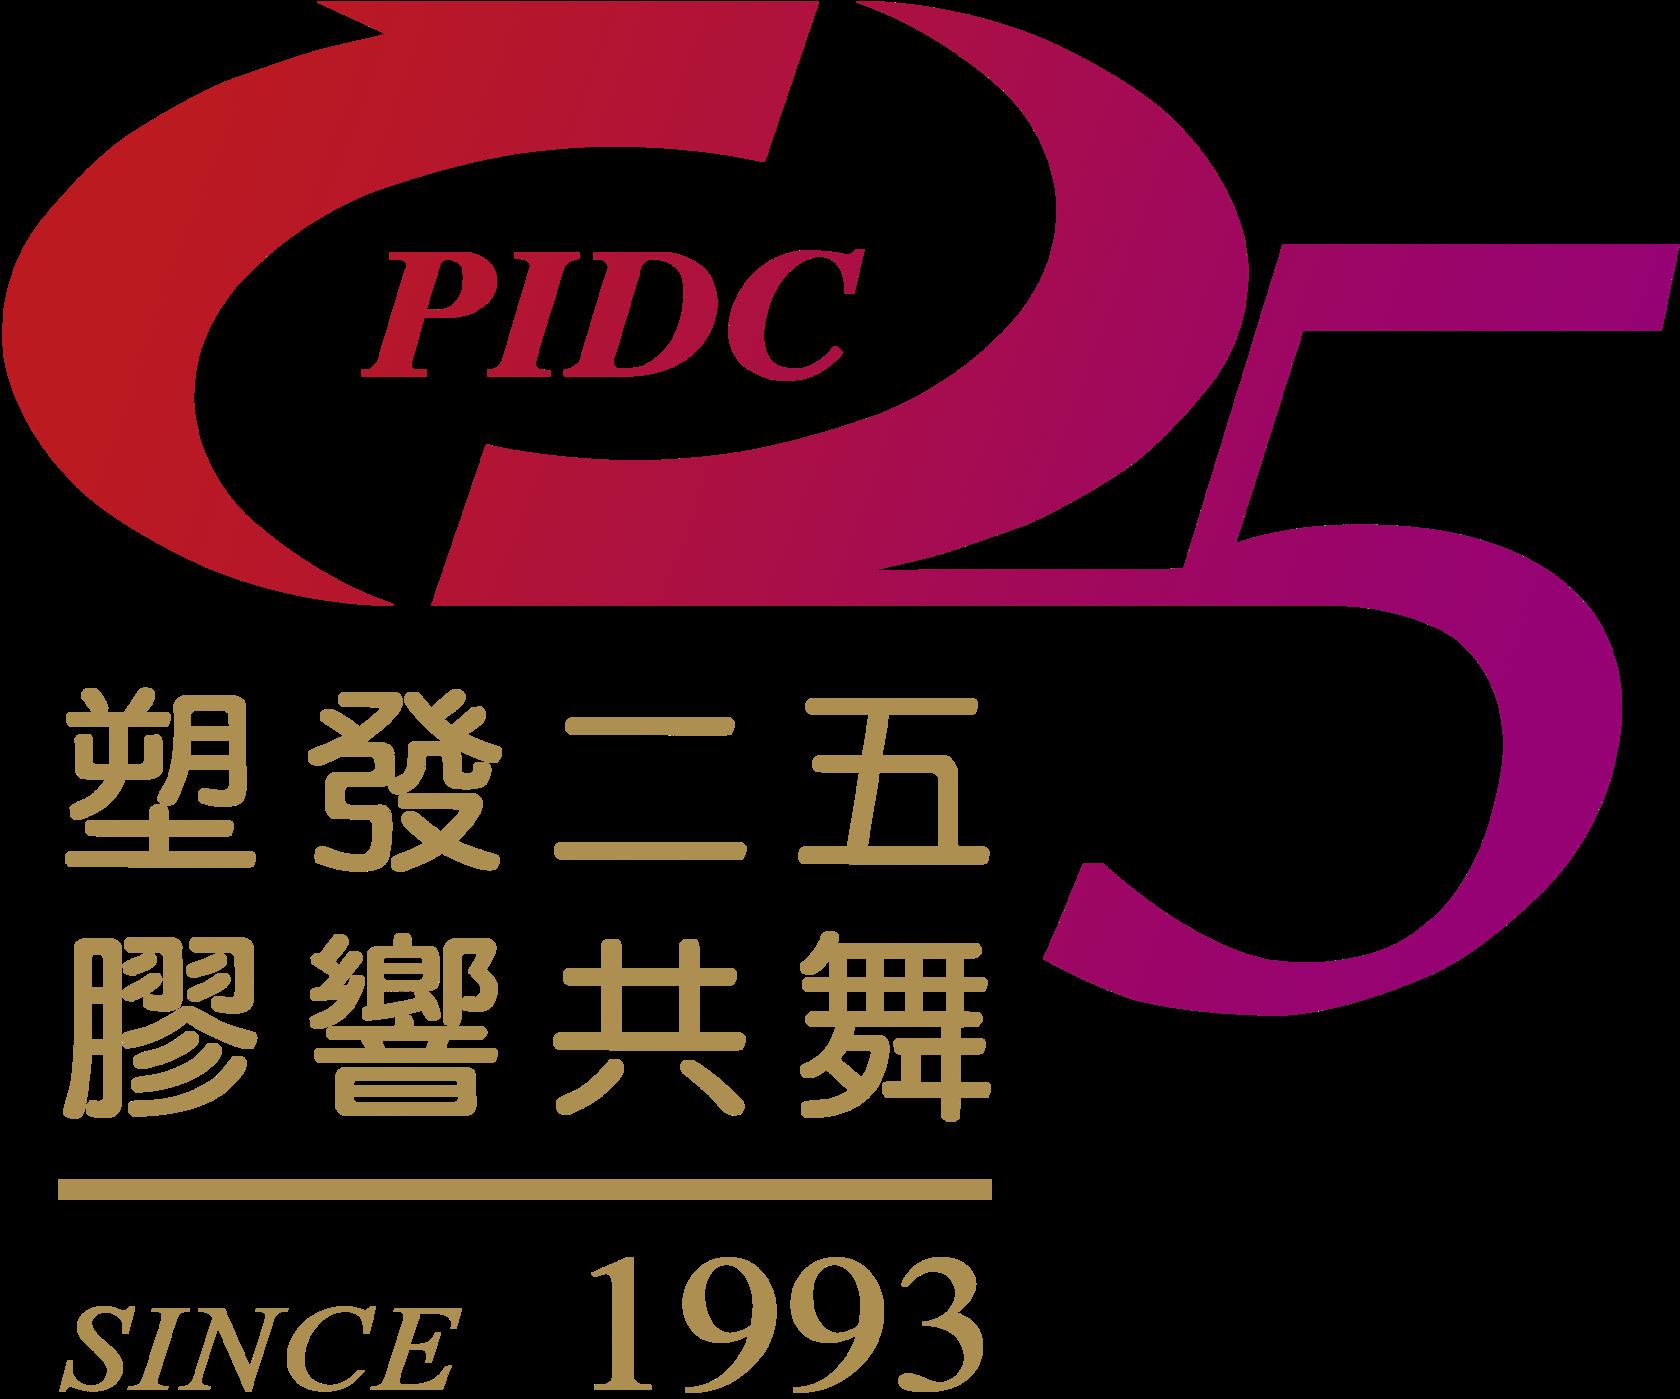 PIDC25